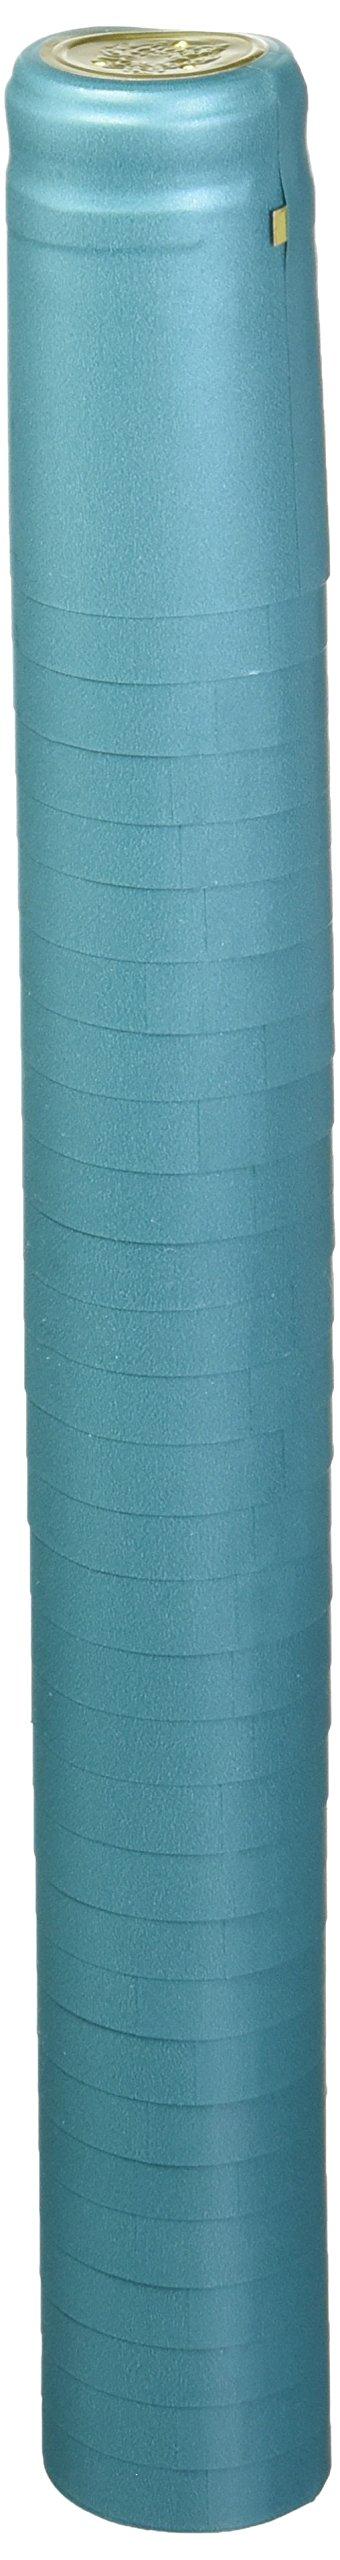 Home Brew Ohio Professional Cork-PVC Package (Metallic Light Blue